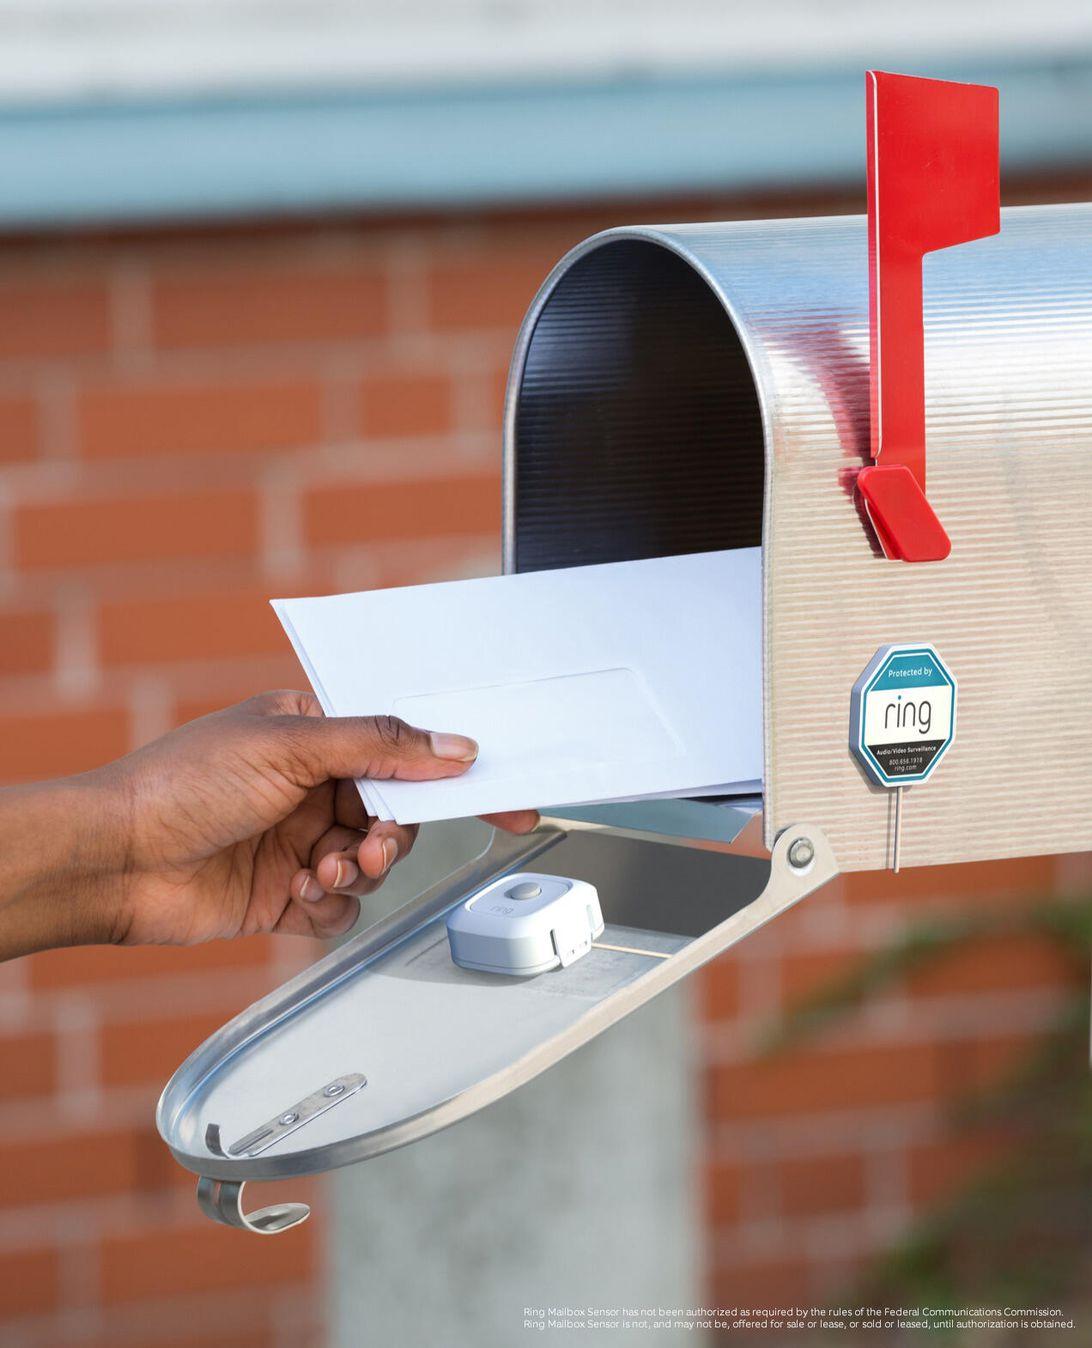 20200921 image blog-mailbox-desktop2x-fcc-rgb